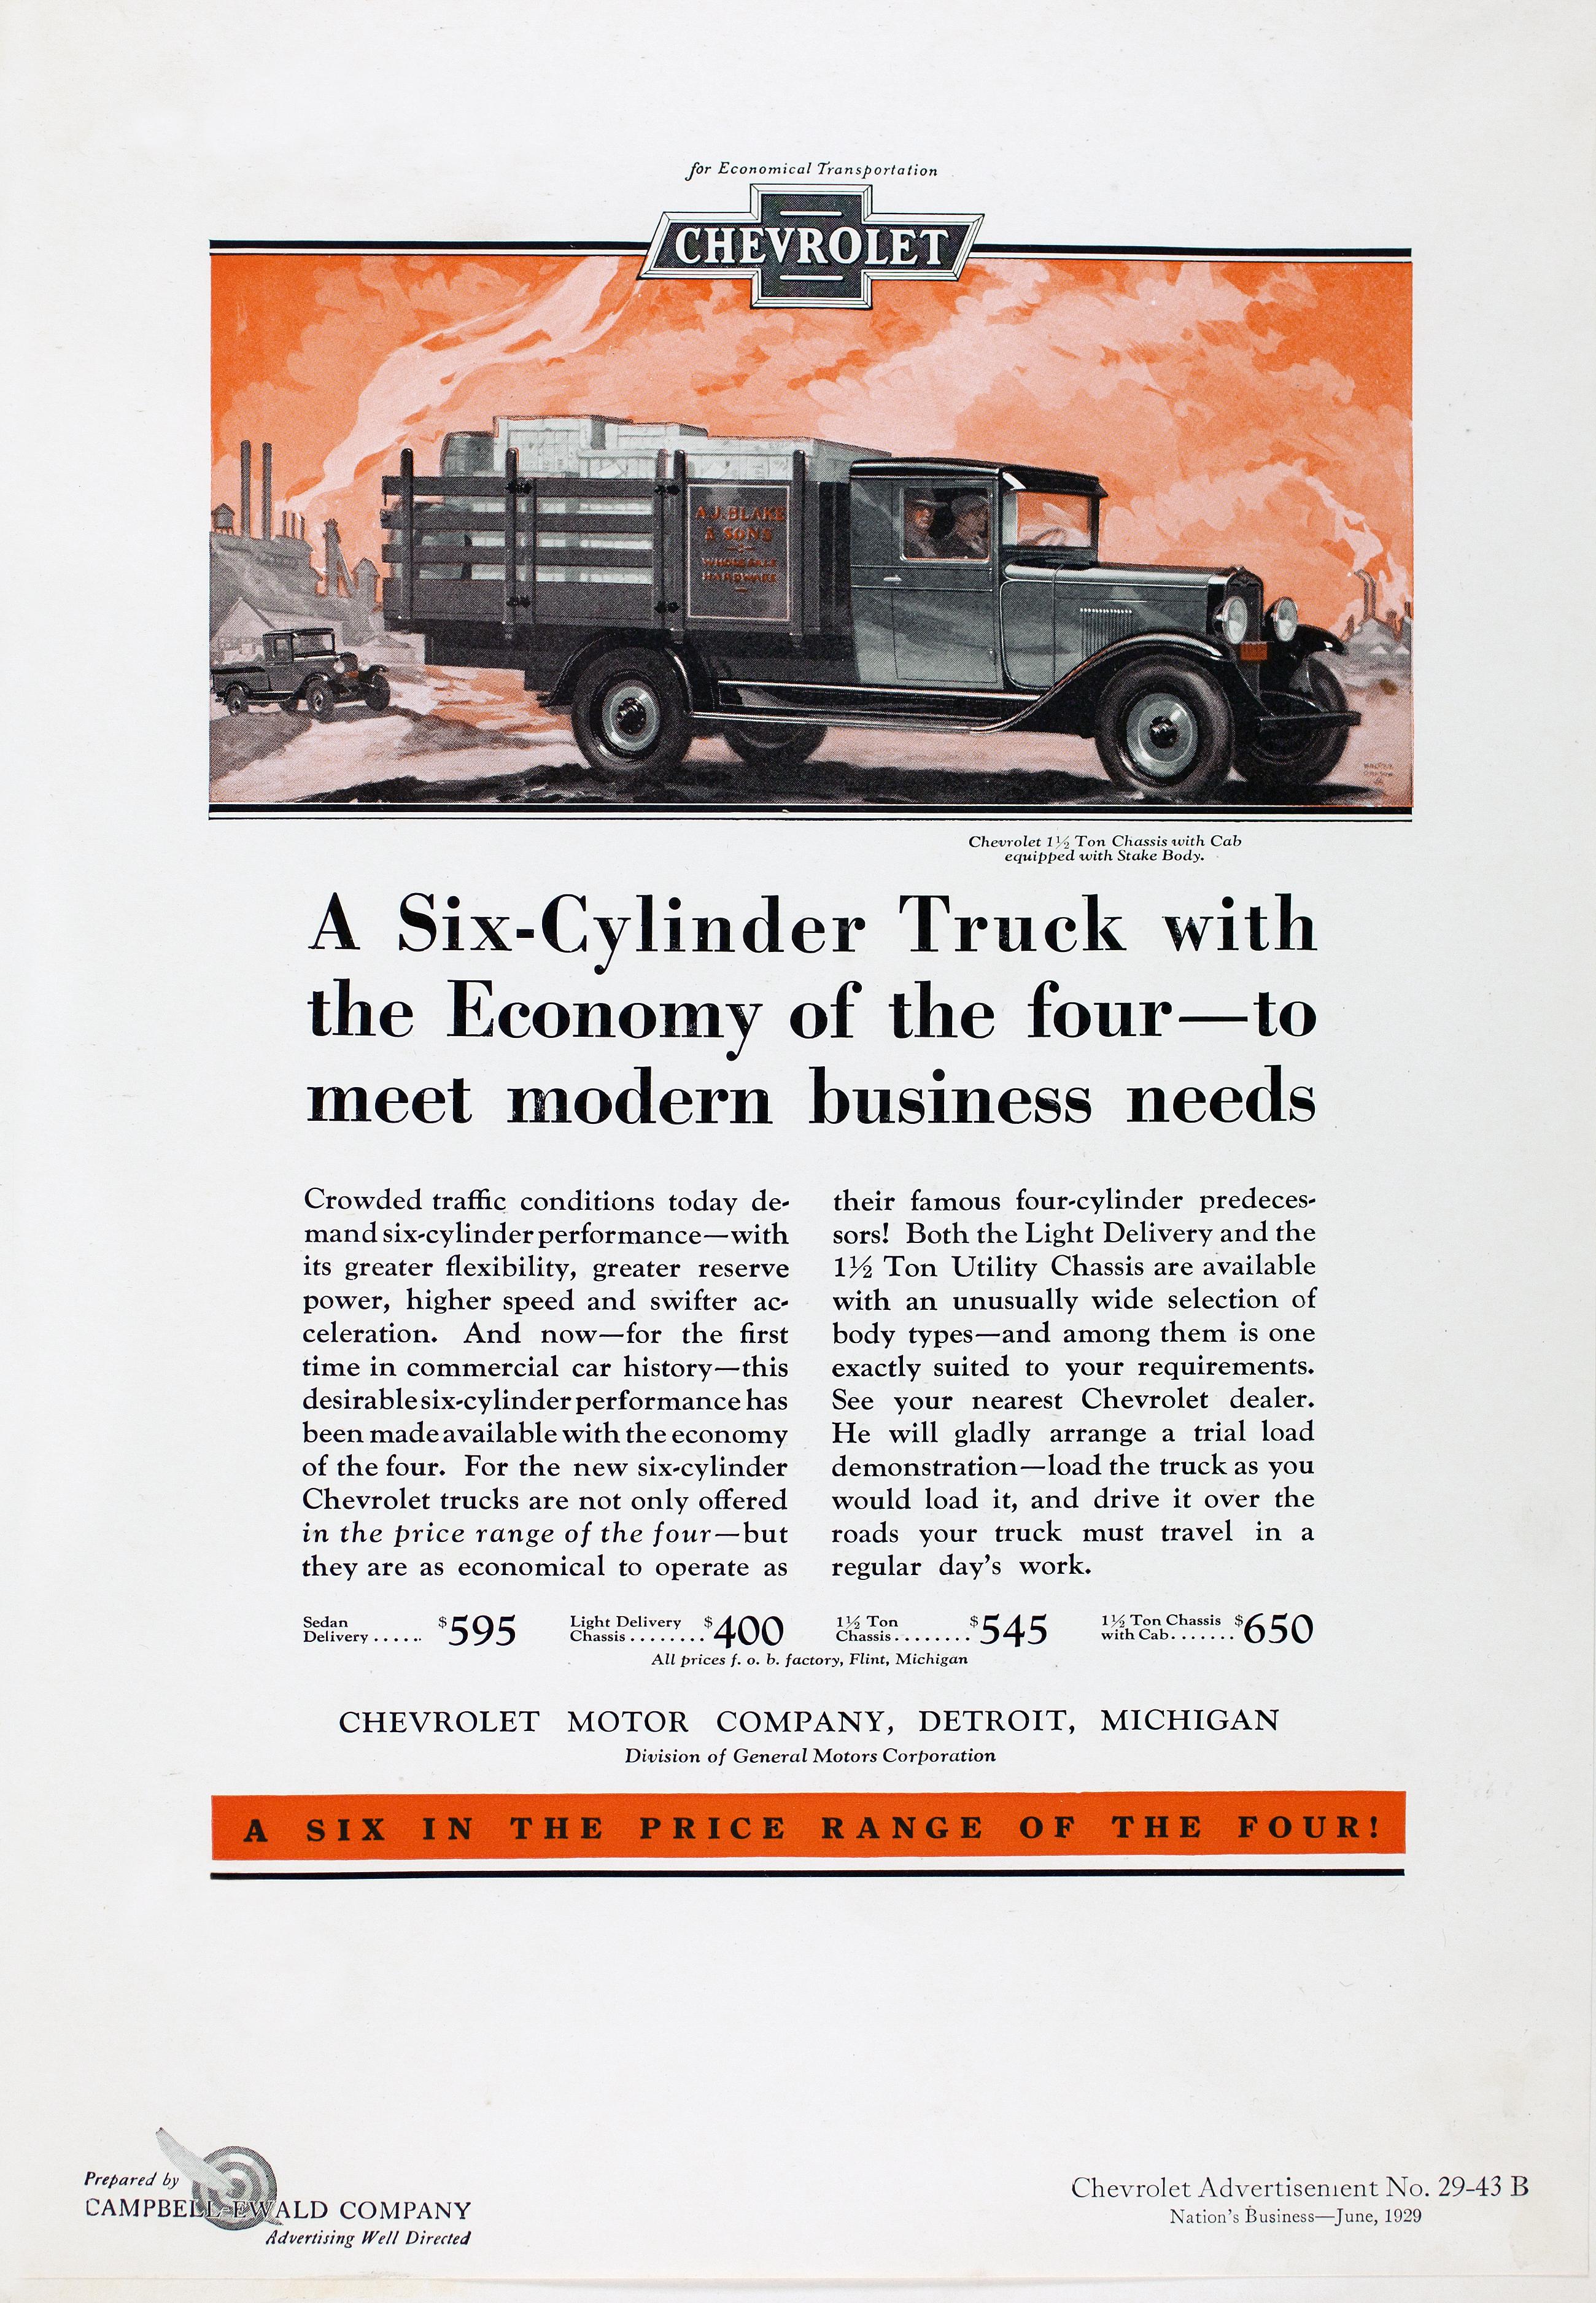 Chevrolet Pressroom United States Images